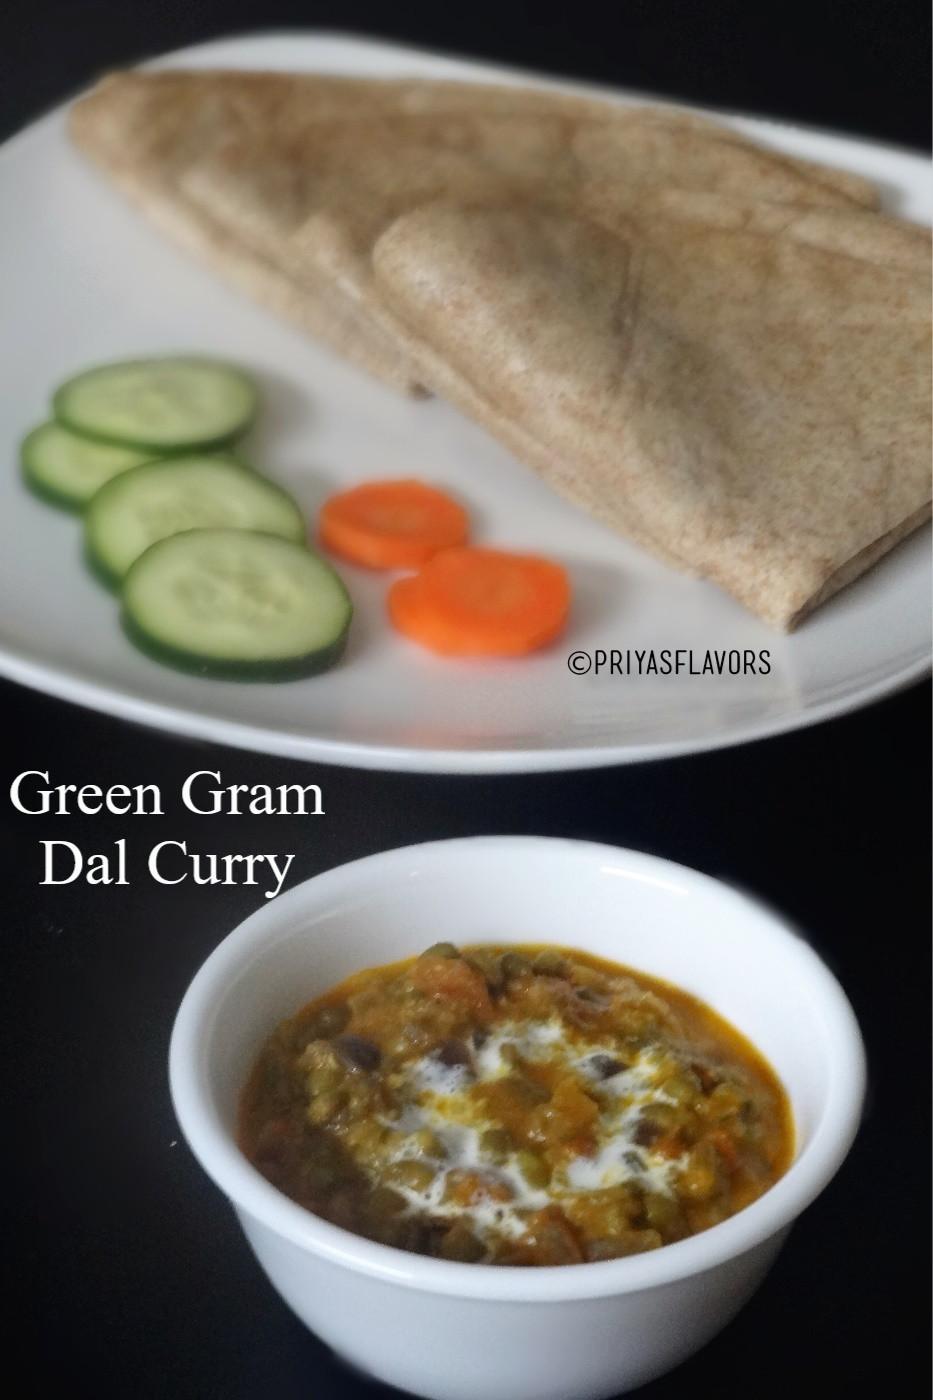 Green gram dal curry